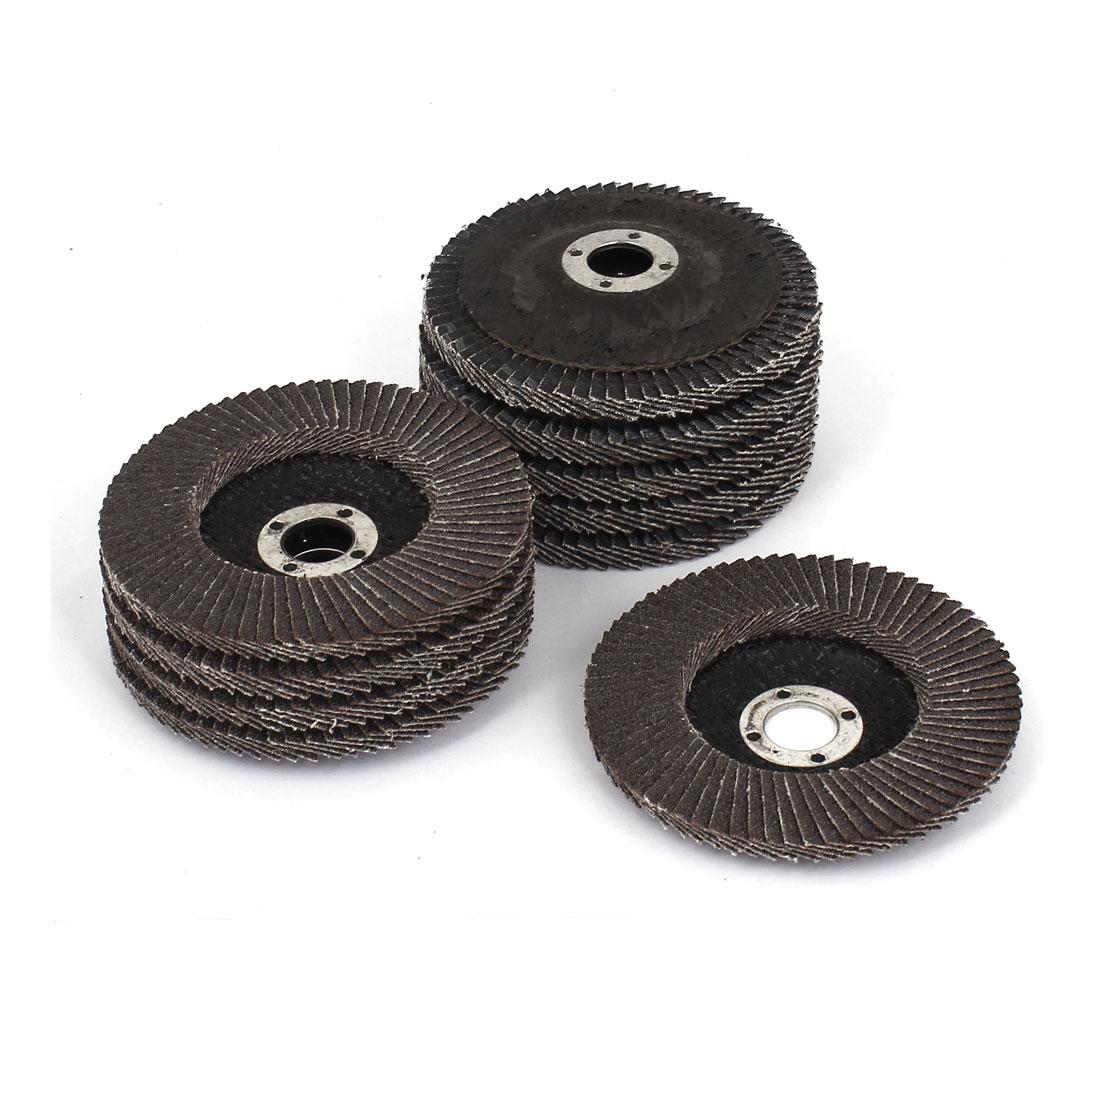 "10pcs 100mm 4"" Dia 16mm Bore 60 Grit Flap Sanding Discs Polishing Grinding Wheel"